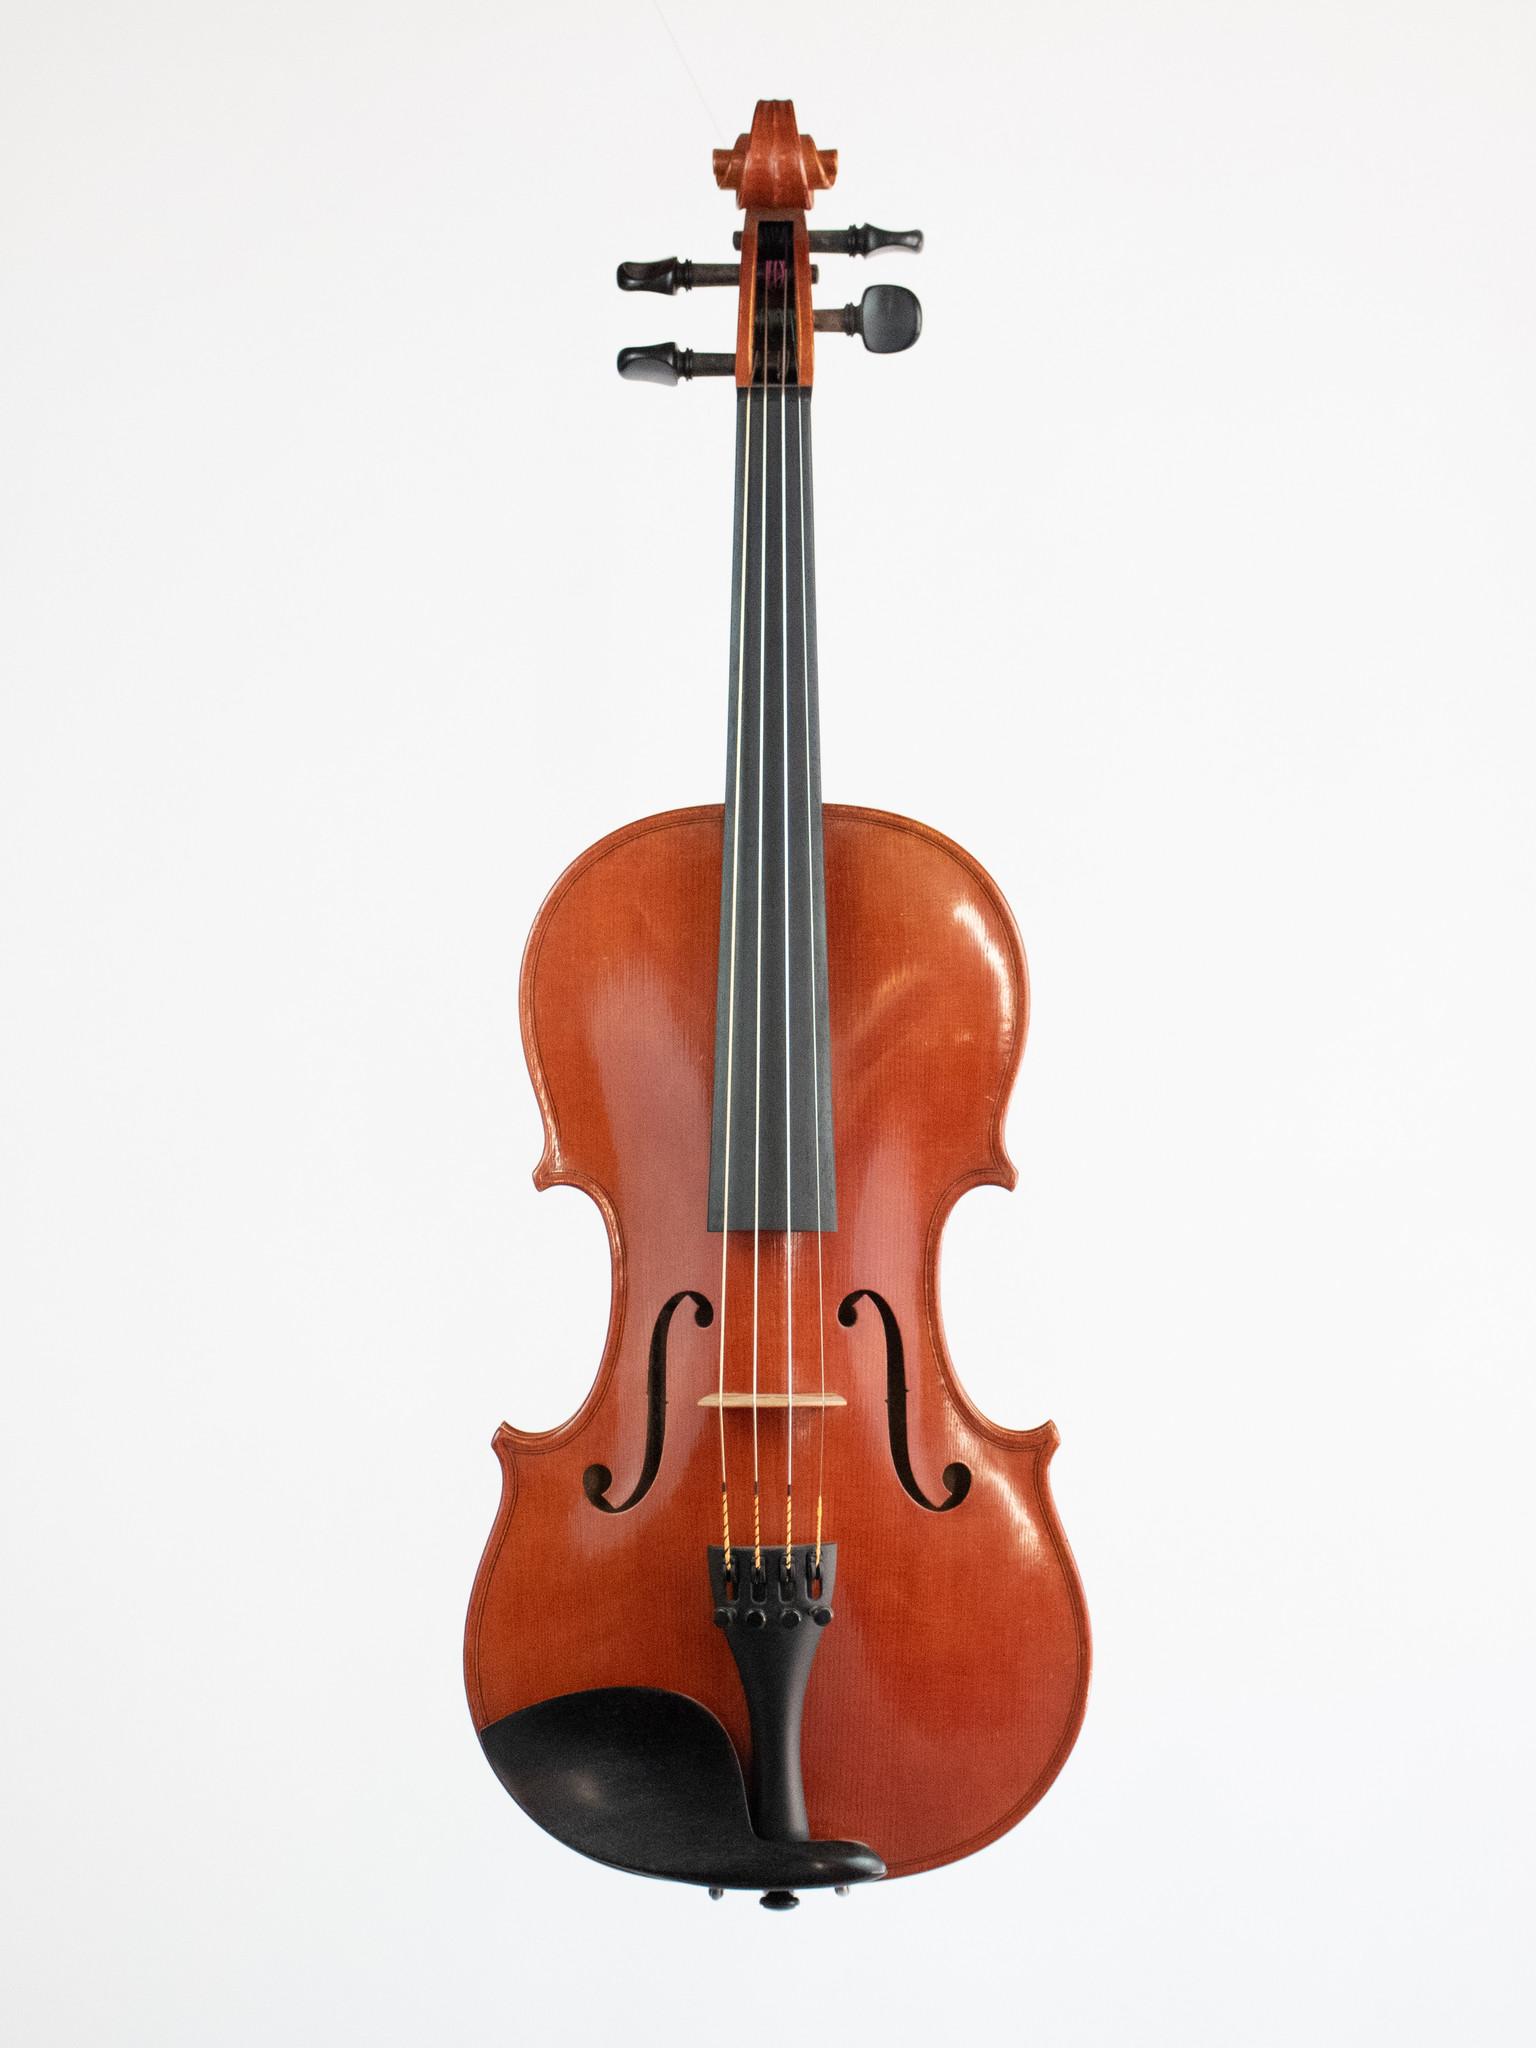 Italian Heyligers Shop violin, Cremona, ITALY, 2004